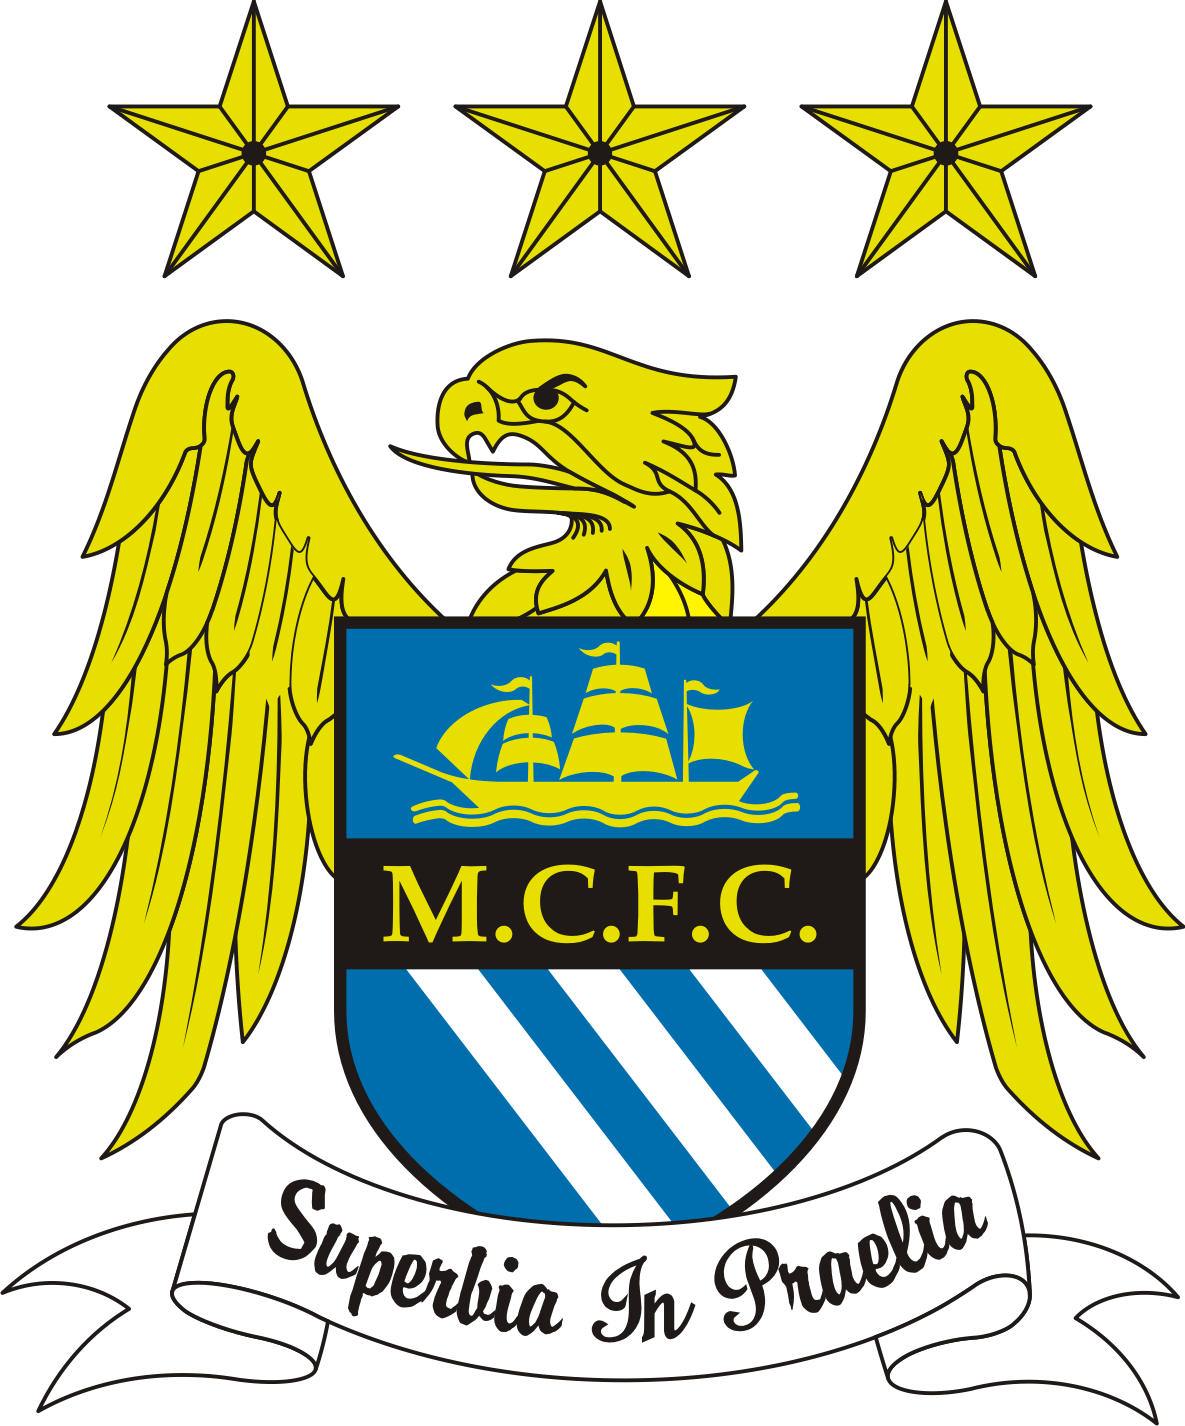 logo manchester city football club kumpulan logo lambang indonesia